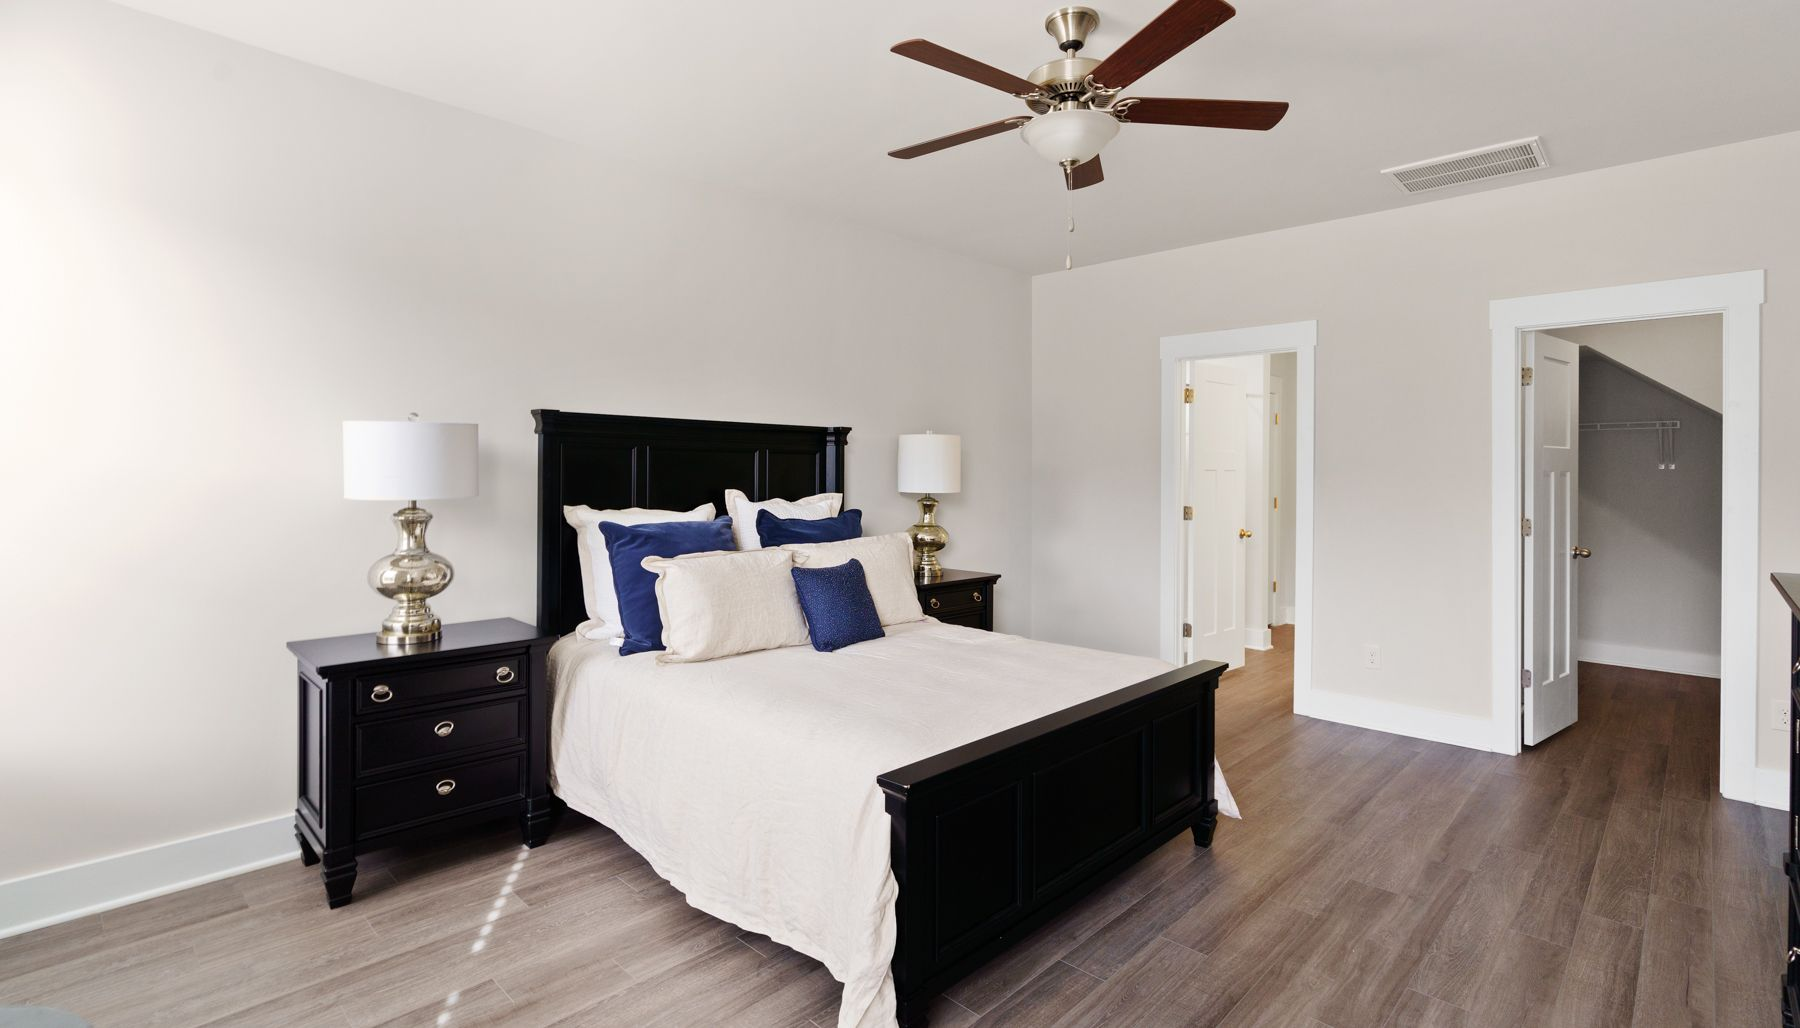 Bedroom featured in the Parker By Dan Ryan Builders in Greenville-Spartanburg, SC